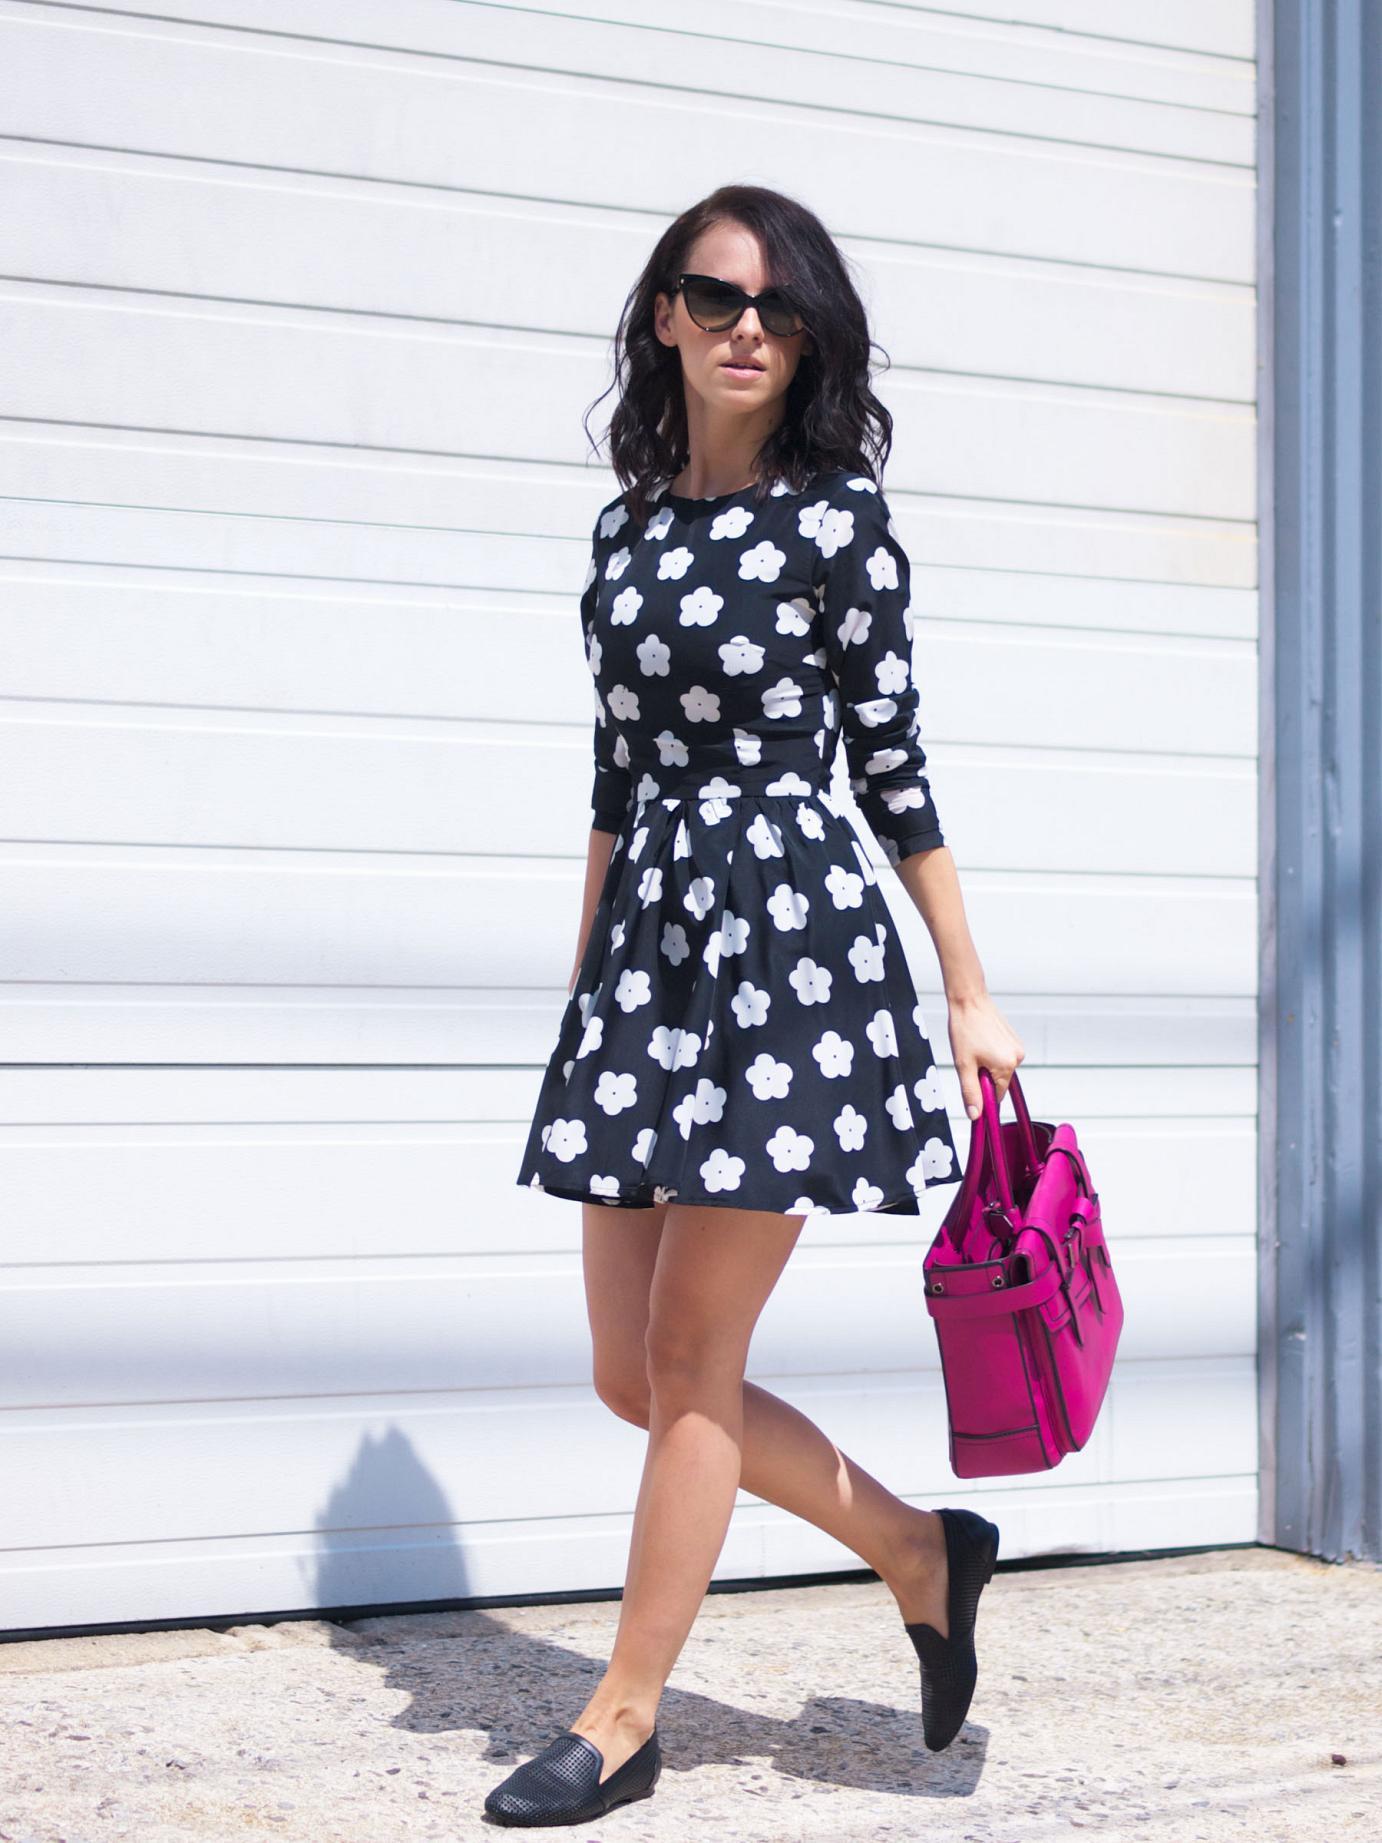 bittersweet colours, floral dress, lbd, summer dress, reed krakoff bag, pink bag, yosi samra shoes, dior sunglasses, street style,